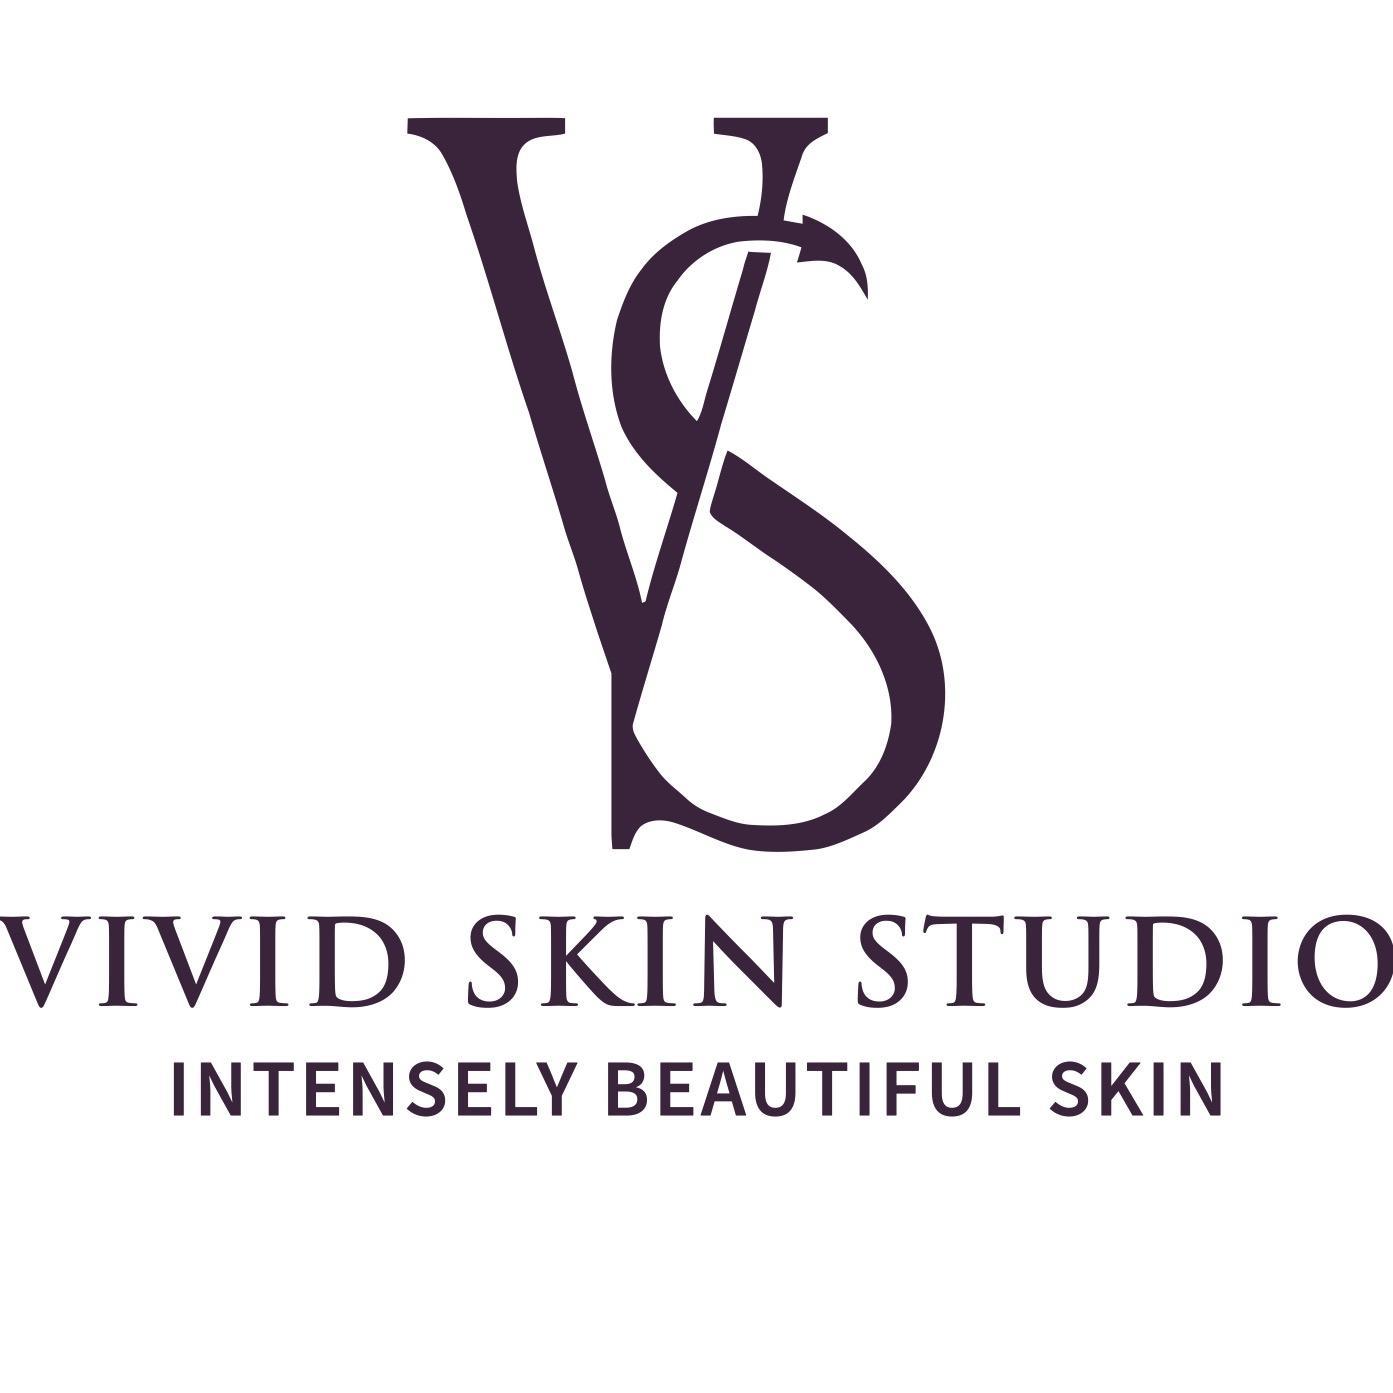 Vivid Skin Studio - Hobe Sound, FL 33455 - (772)932-7338 | ShowMeLocal.com